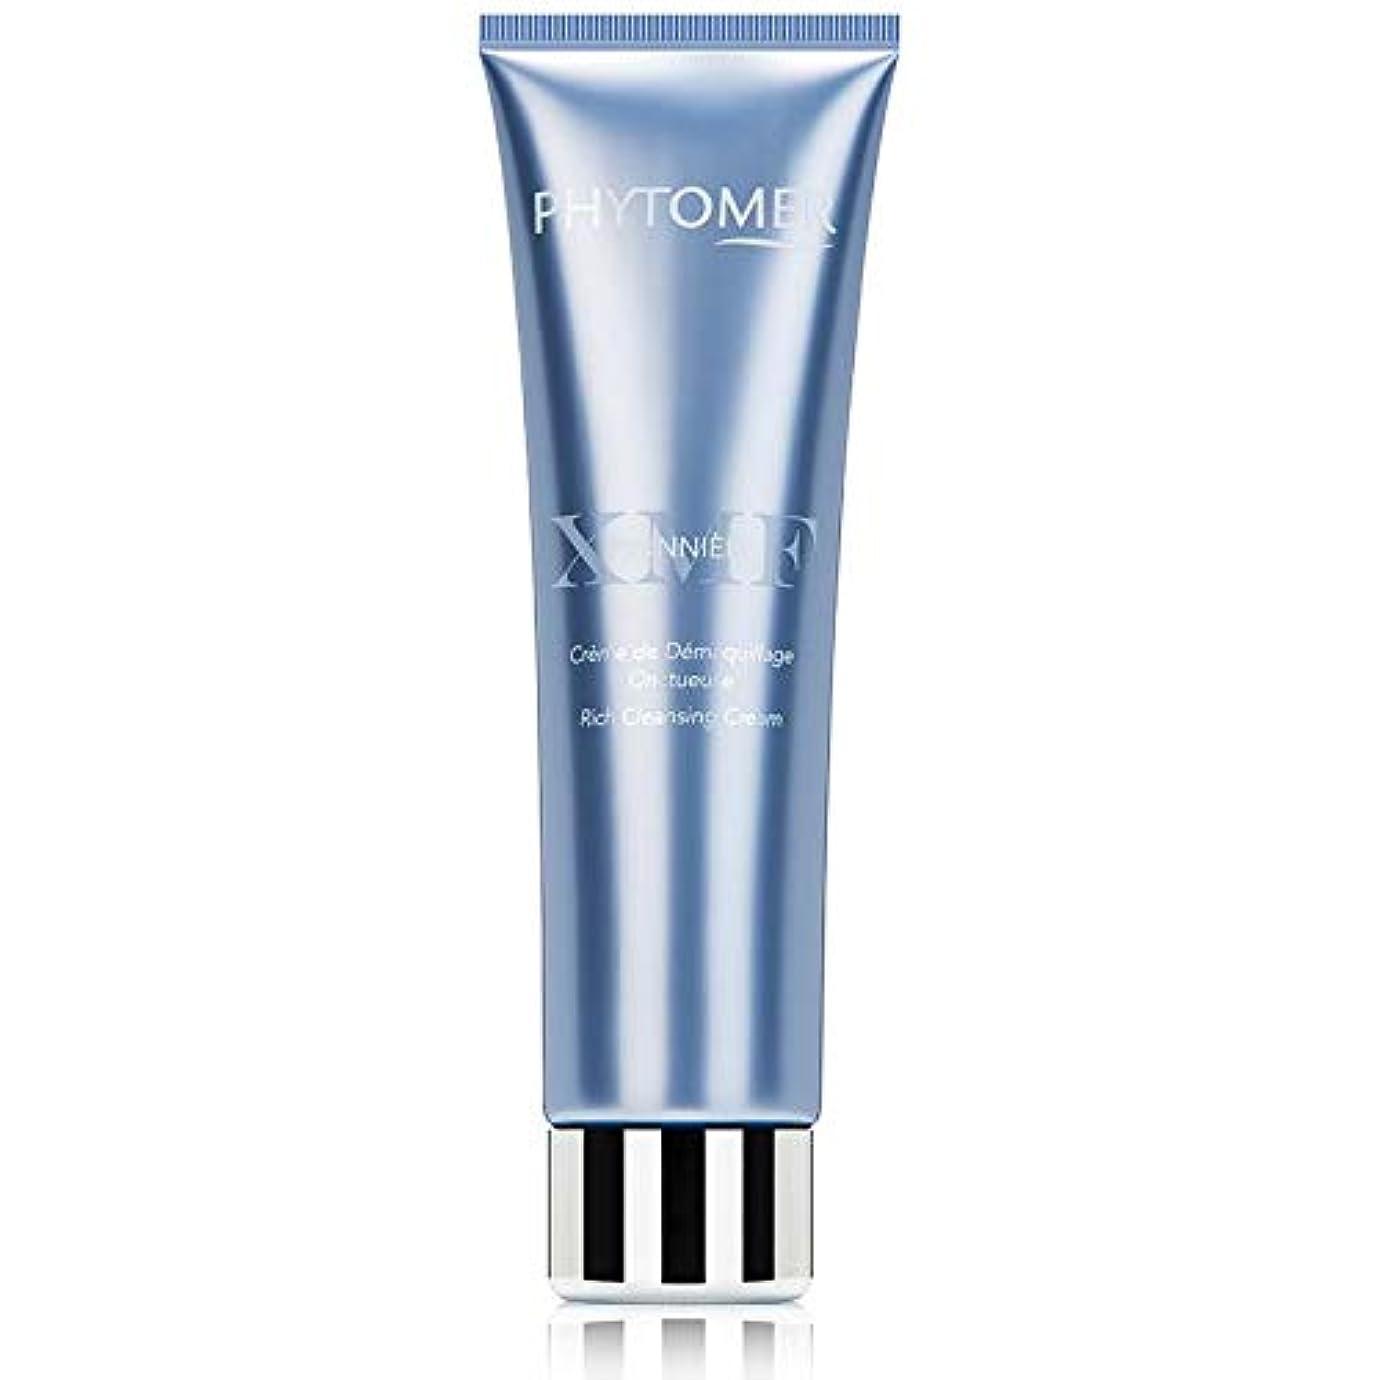 歯車不潔概要Phytomer Pionniere XMF Rich Cleansing Cream 150ml並行輸入品